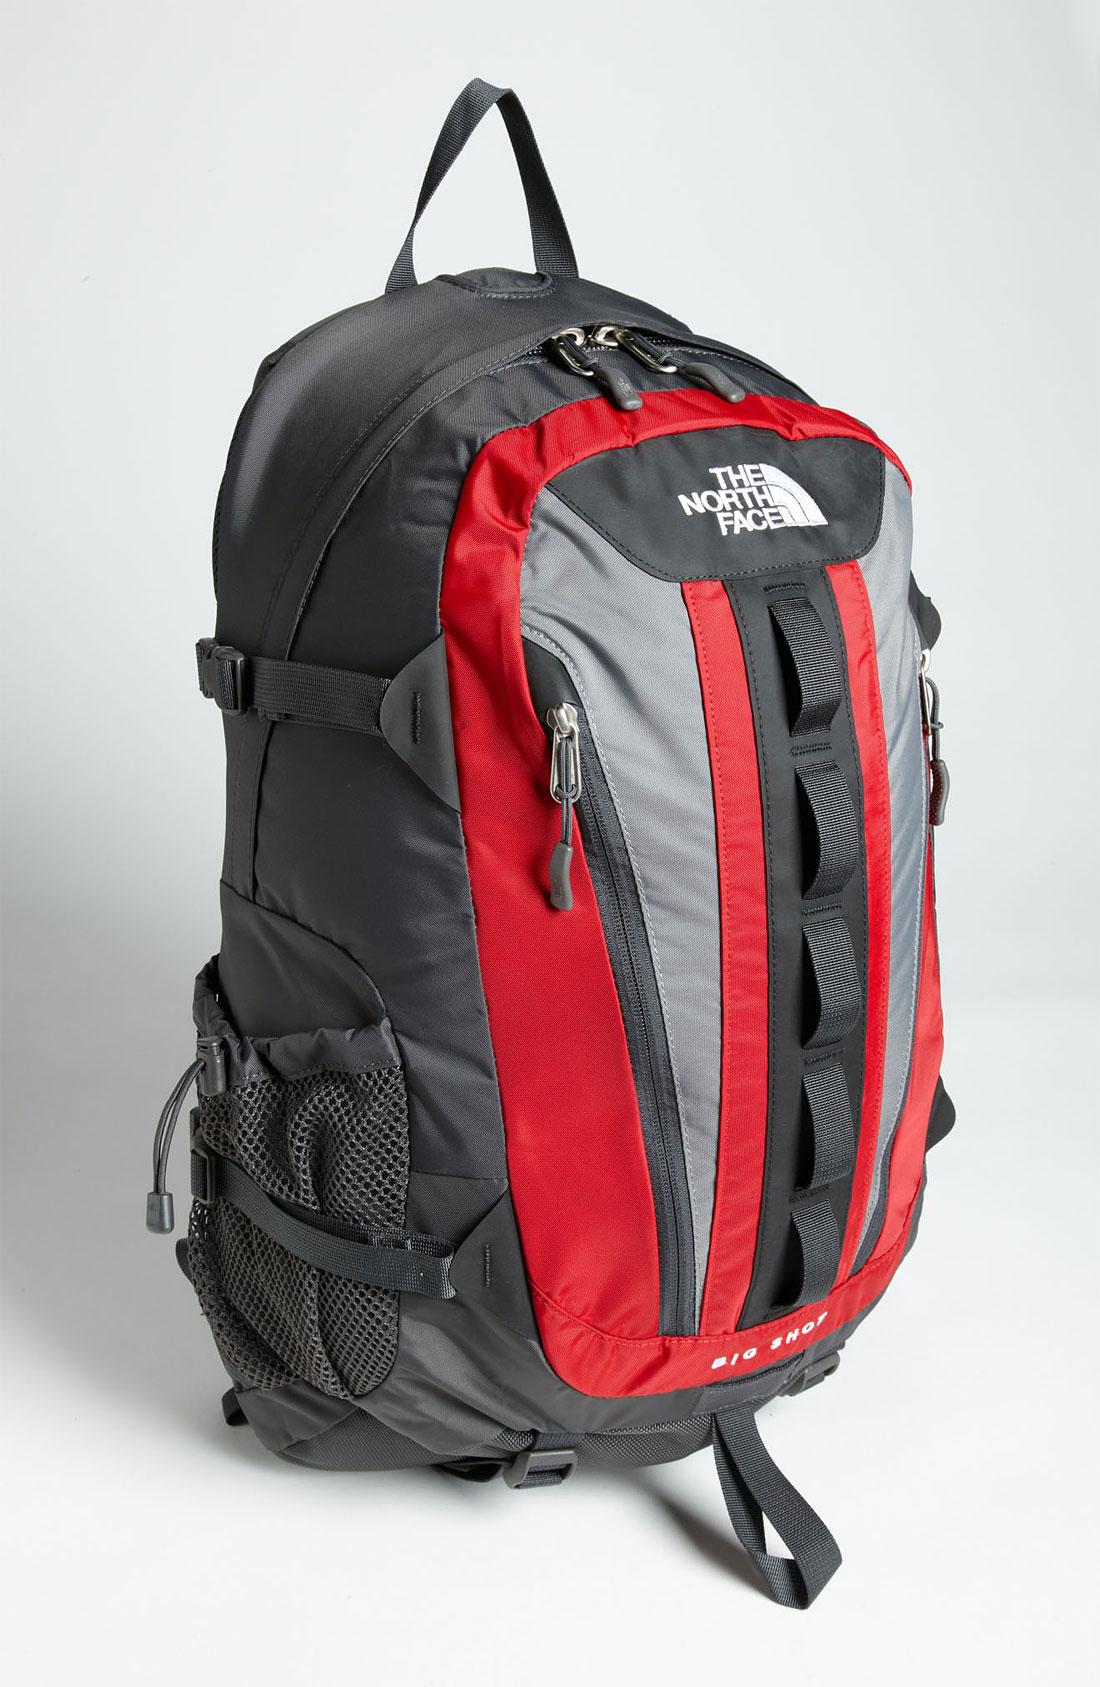 fa34373e79 The North Face Big Shot 2 Laptop Backpack- Fenix Toulouse Handball